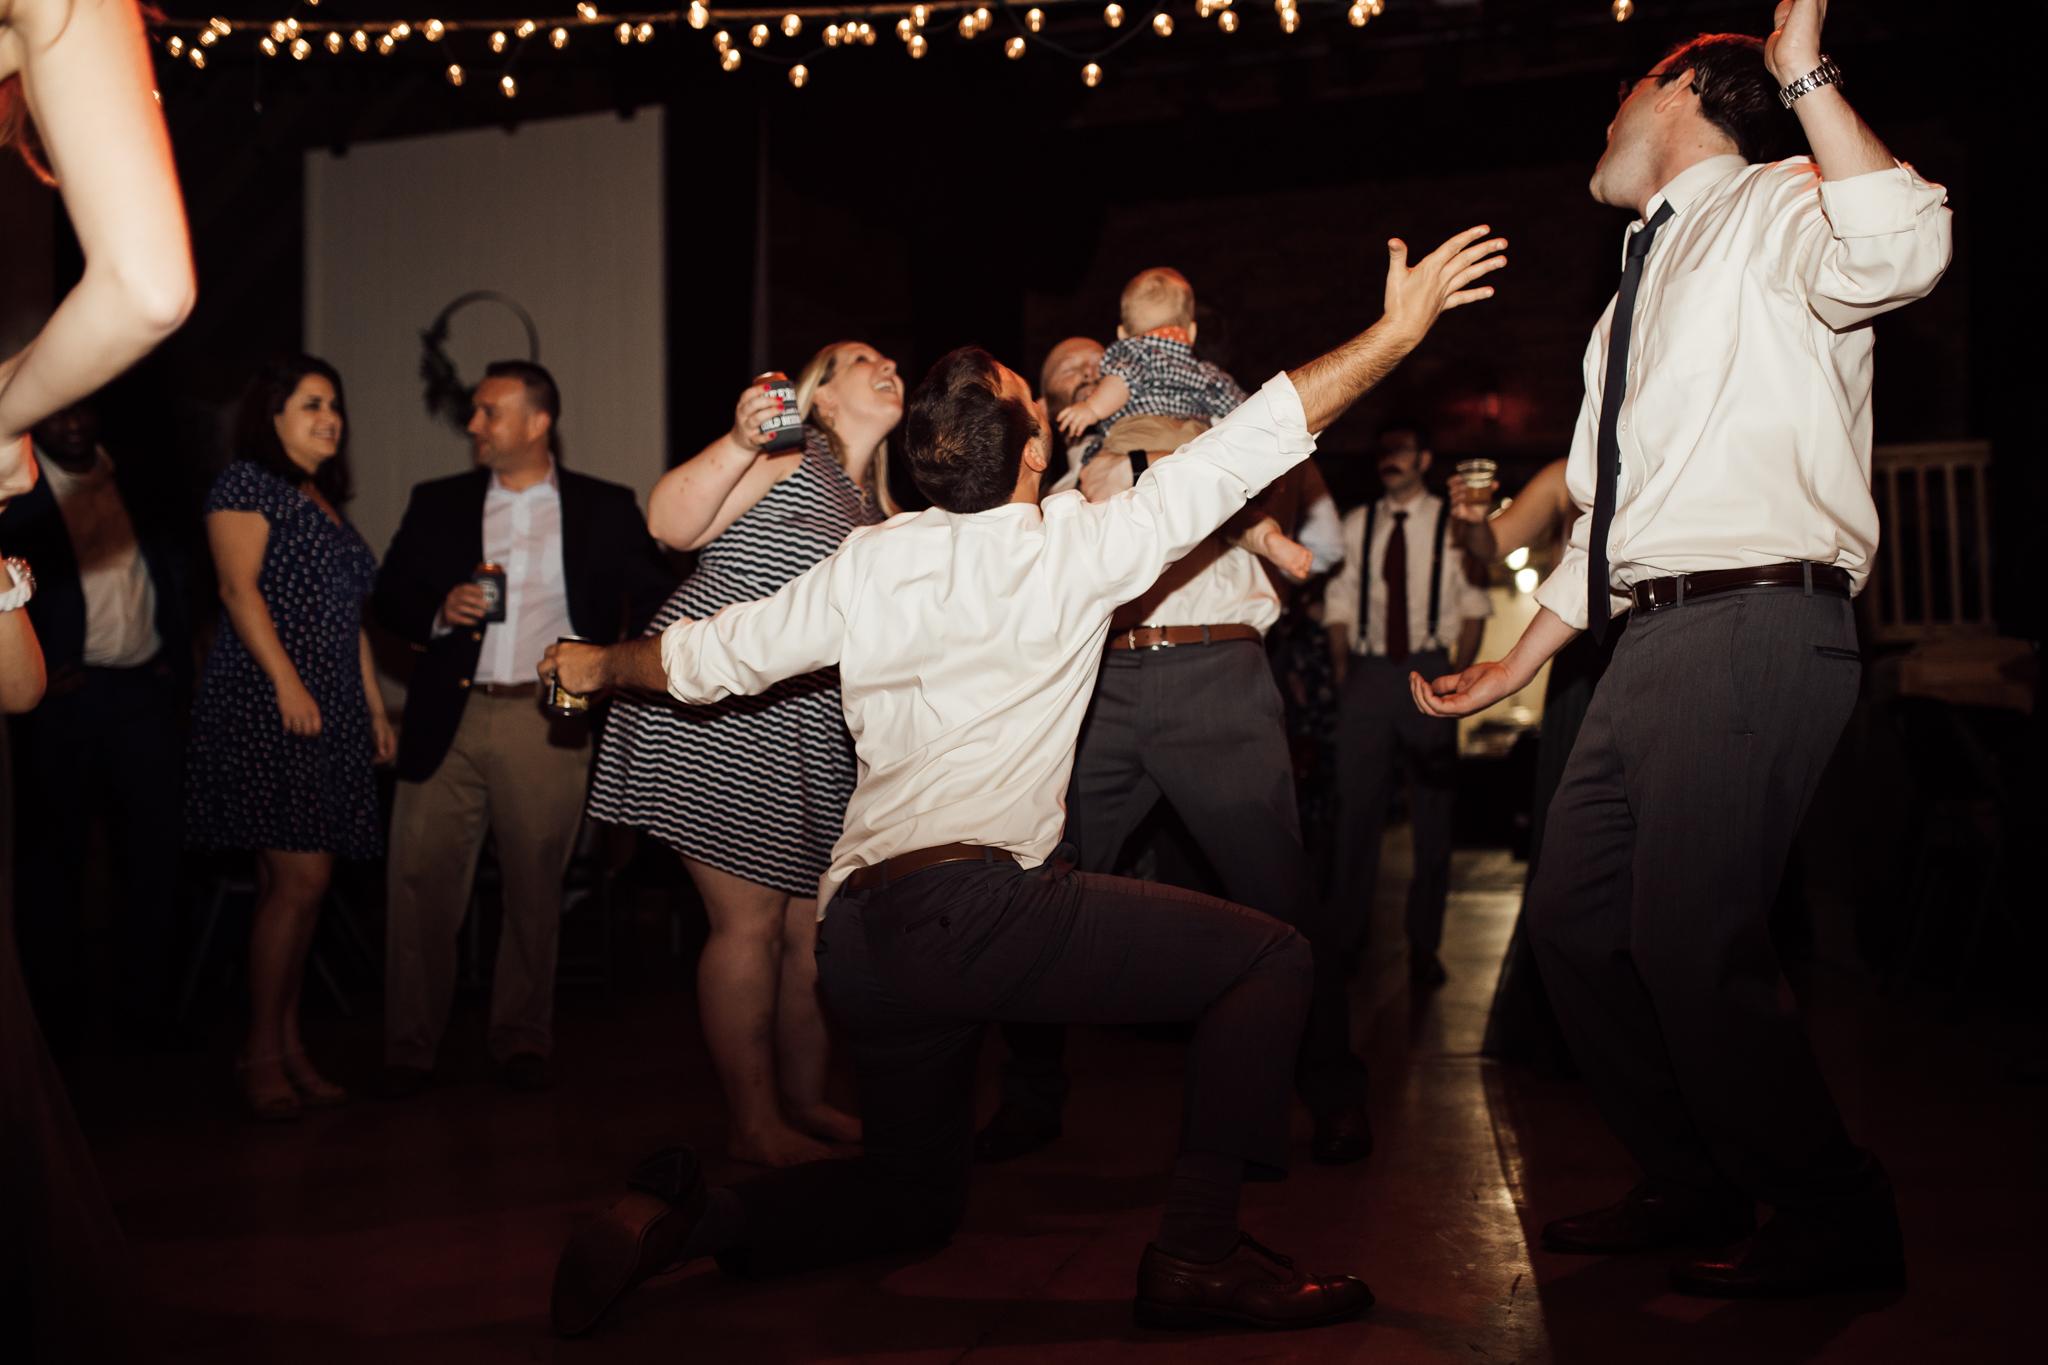 birmingham-alabama-wedding-photographer-laura-terry-the-warmth-around-you (104 of 110).jpg